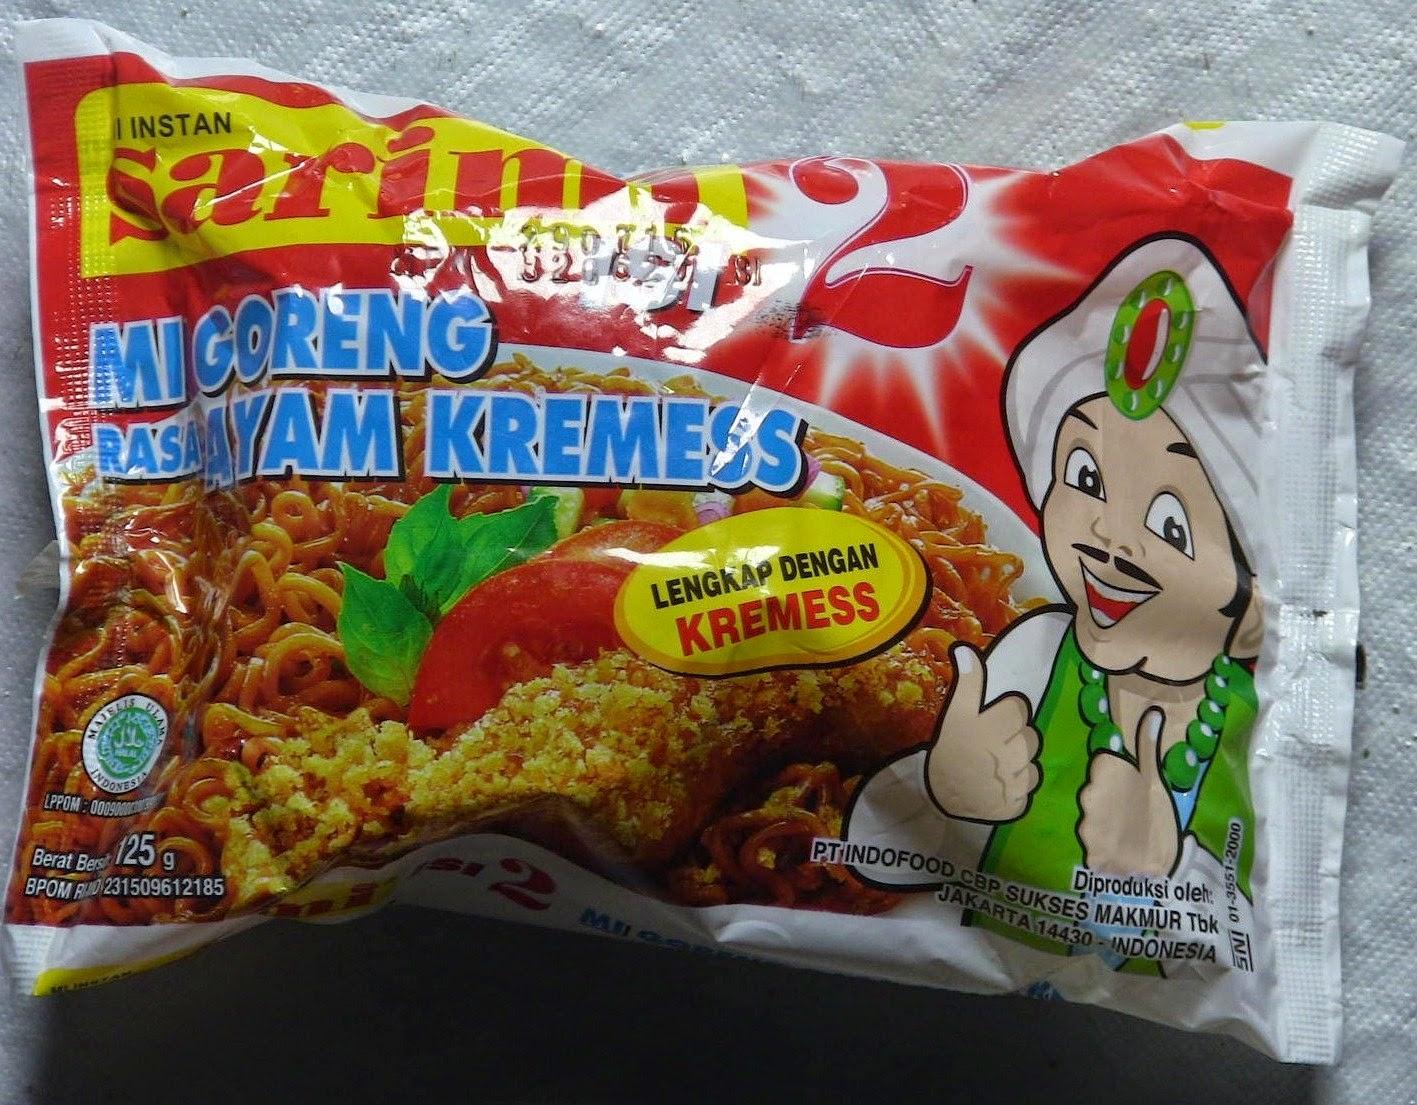 Mi Goreng Rasa Ayam Kremes dari Indo Food